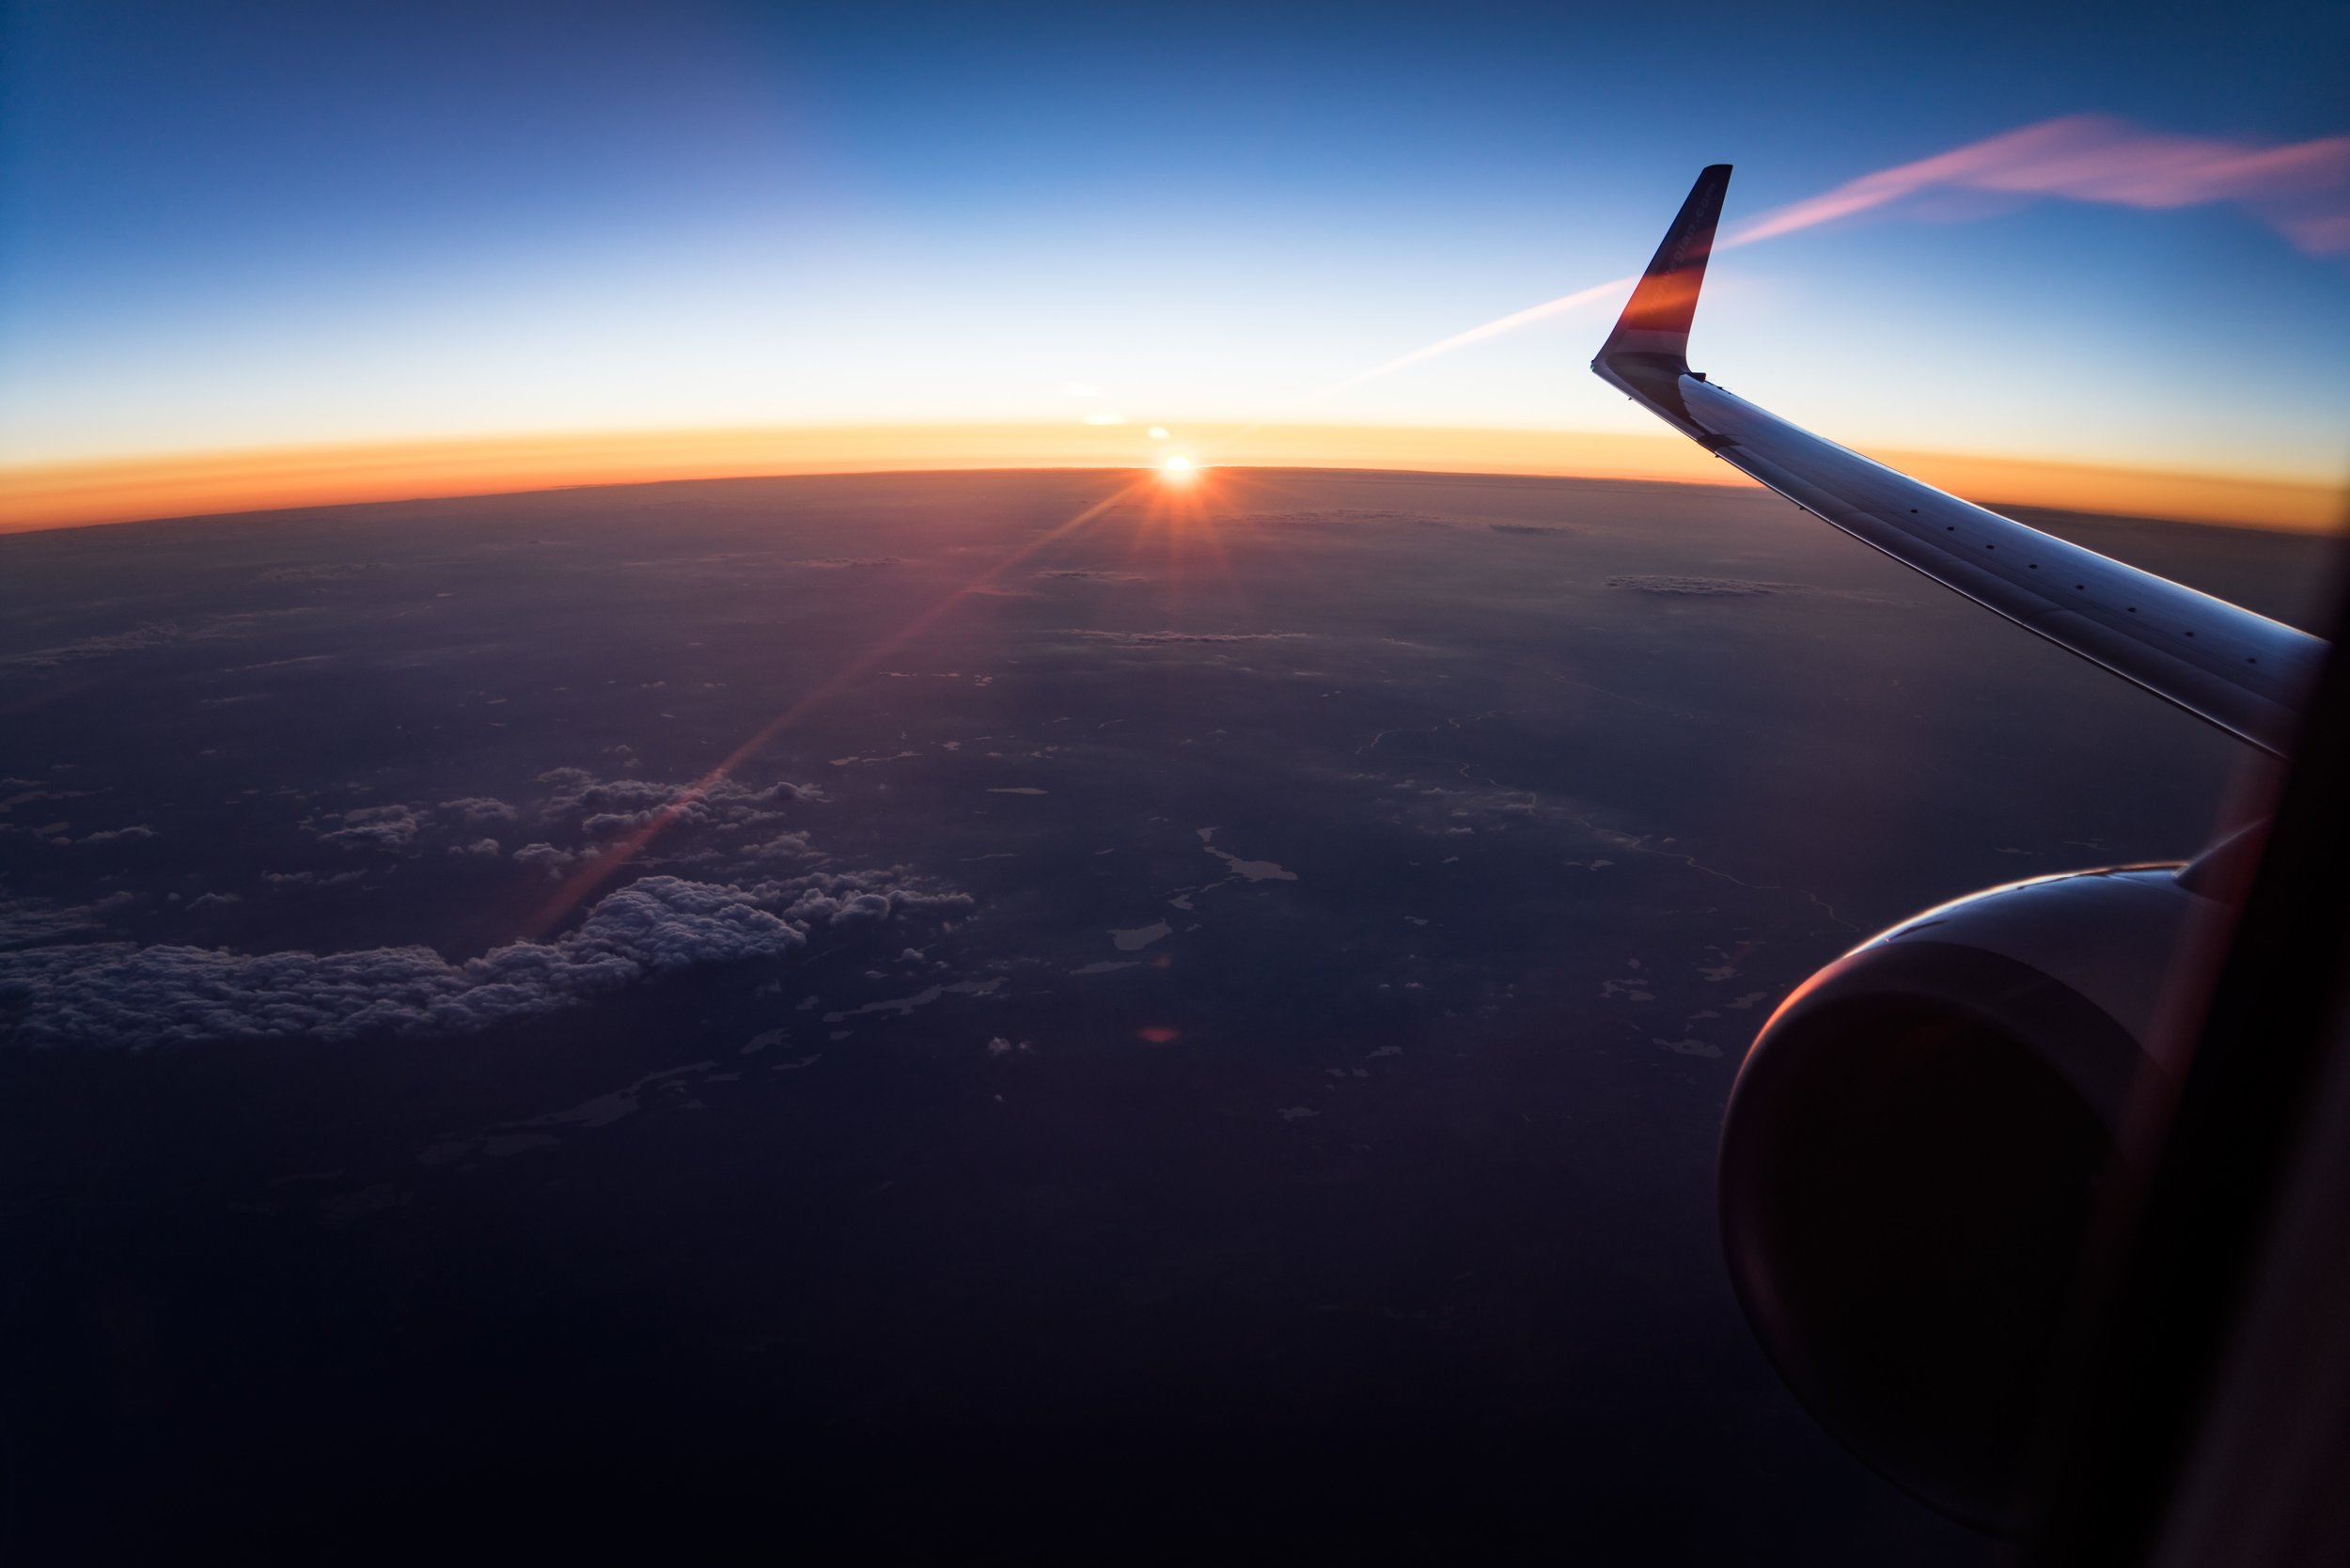 above-aeroplane-aircraft-engine-91217.jpg